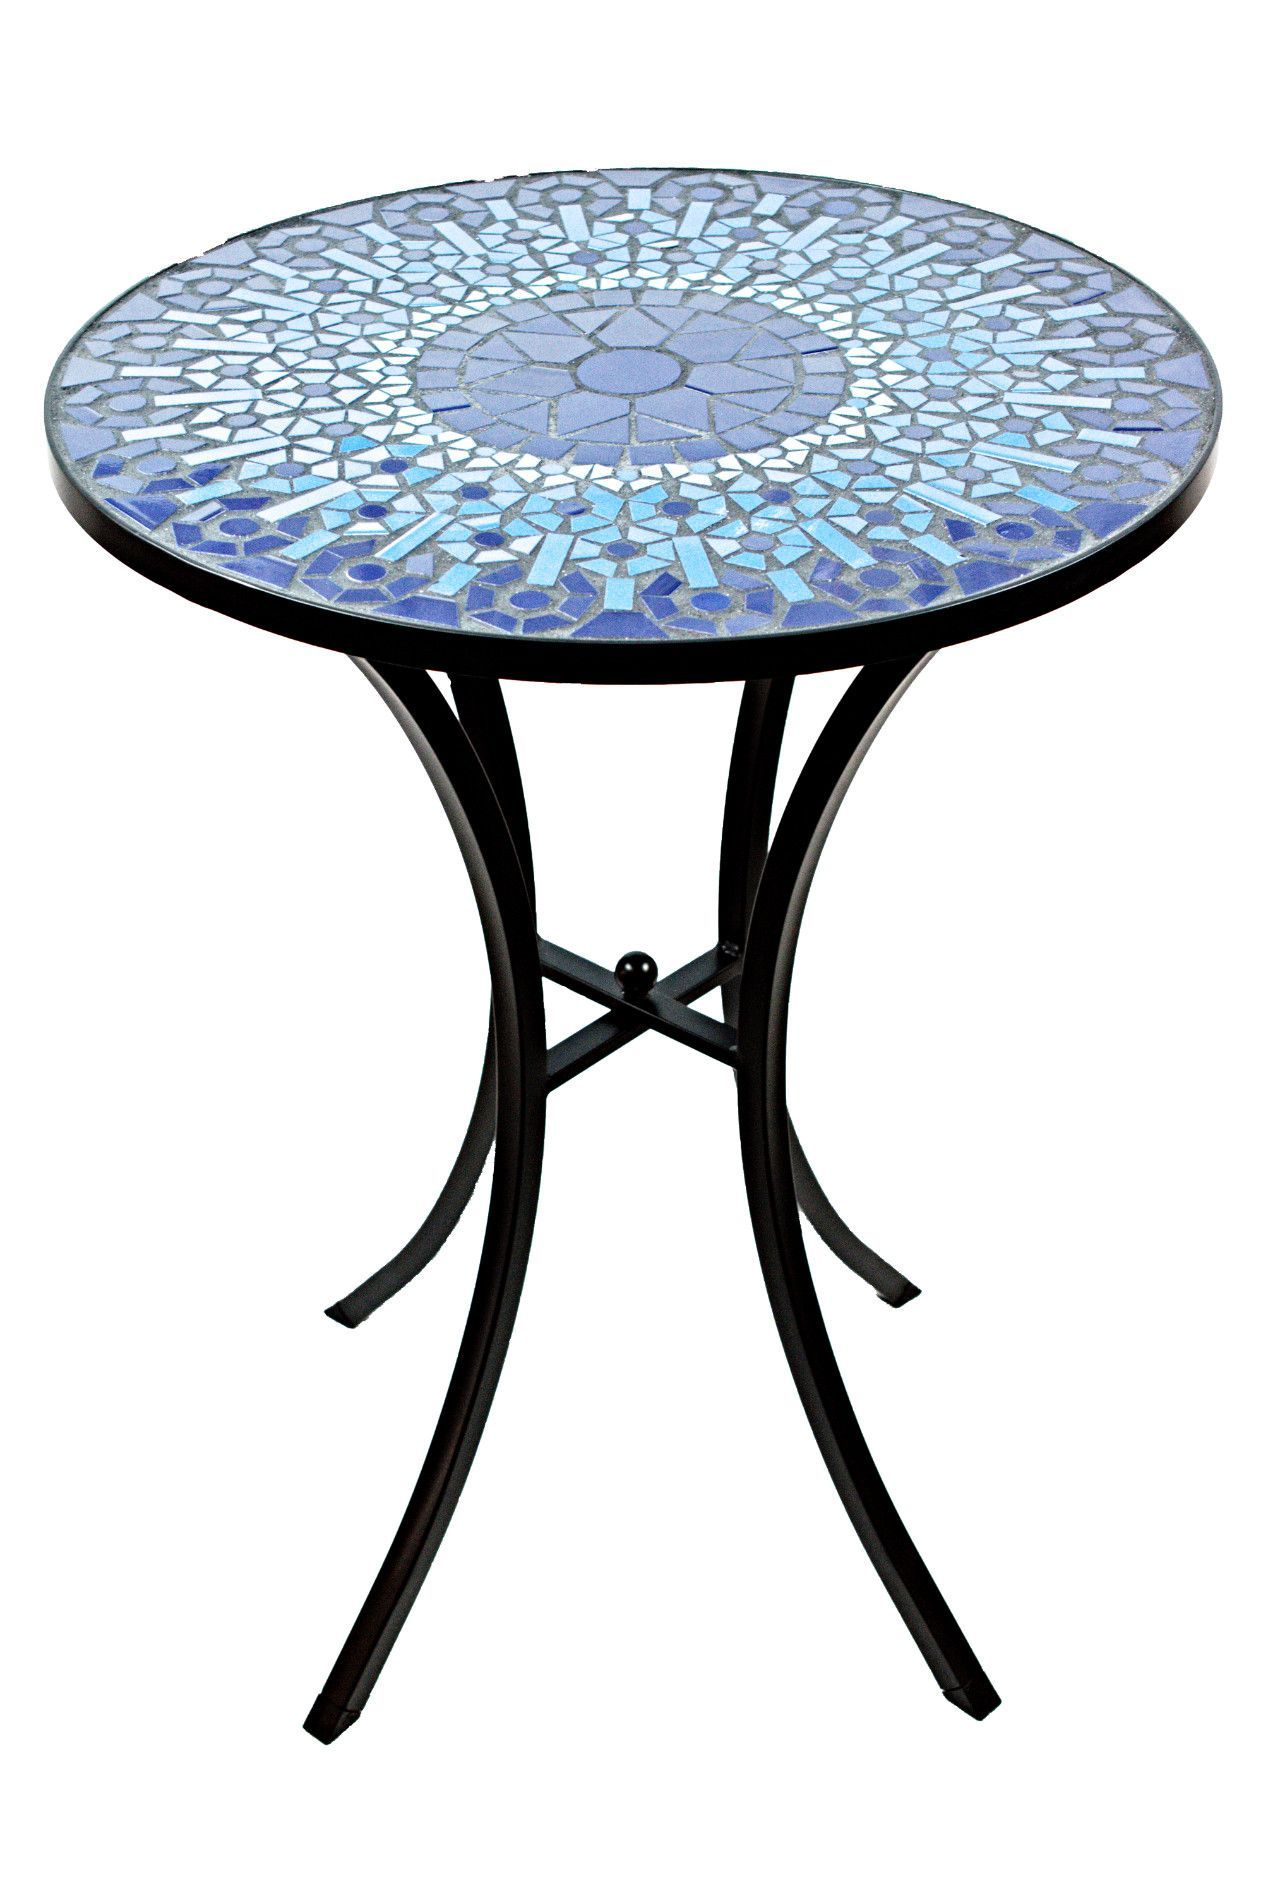 Mosaic Accent Table Mosaic Accent Table Mosaic Furniture